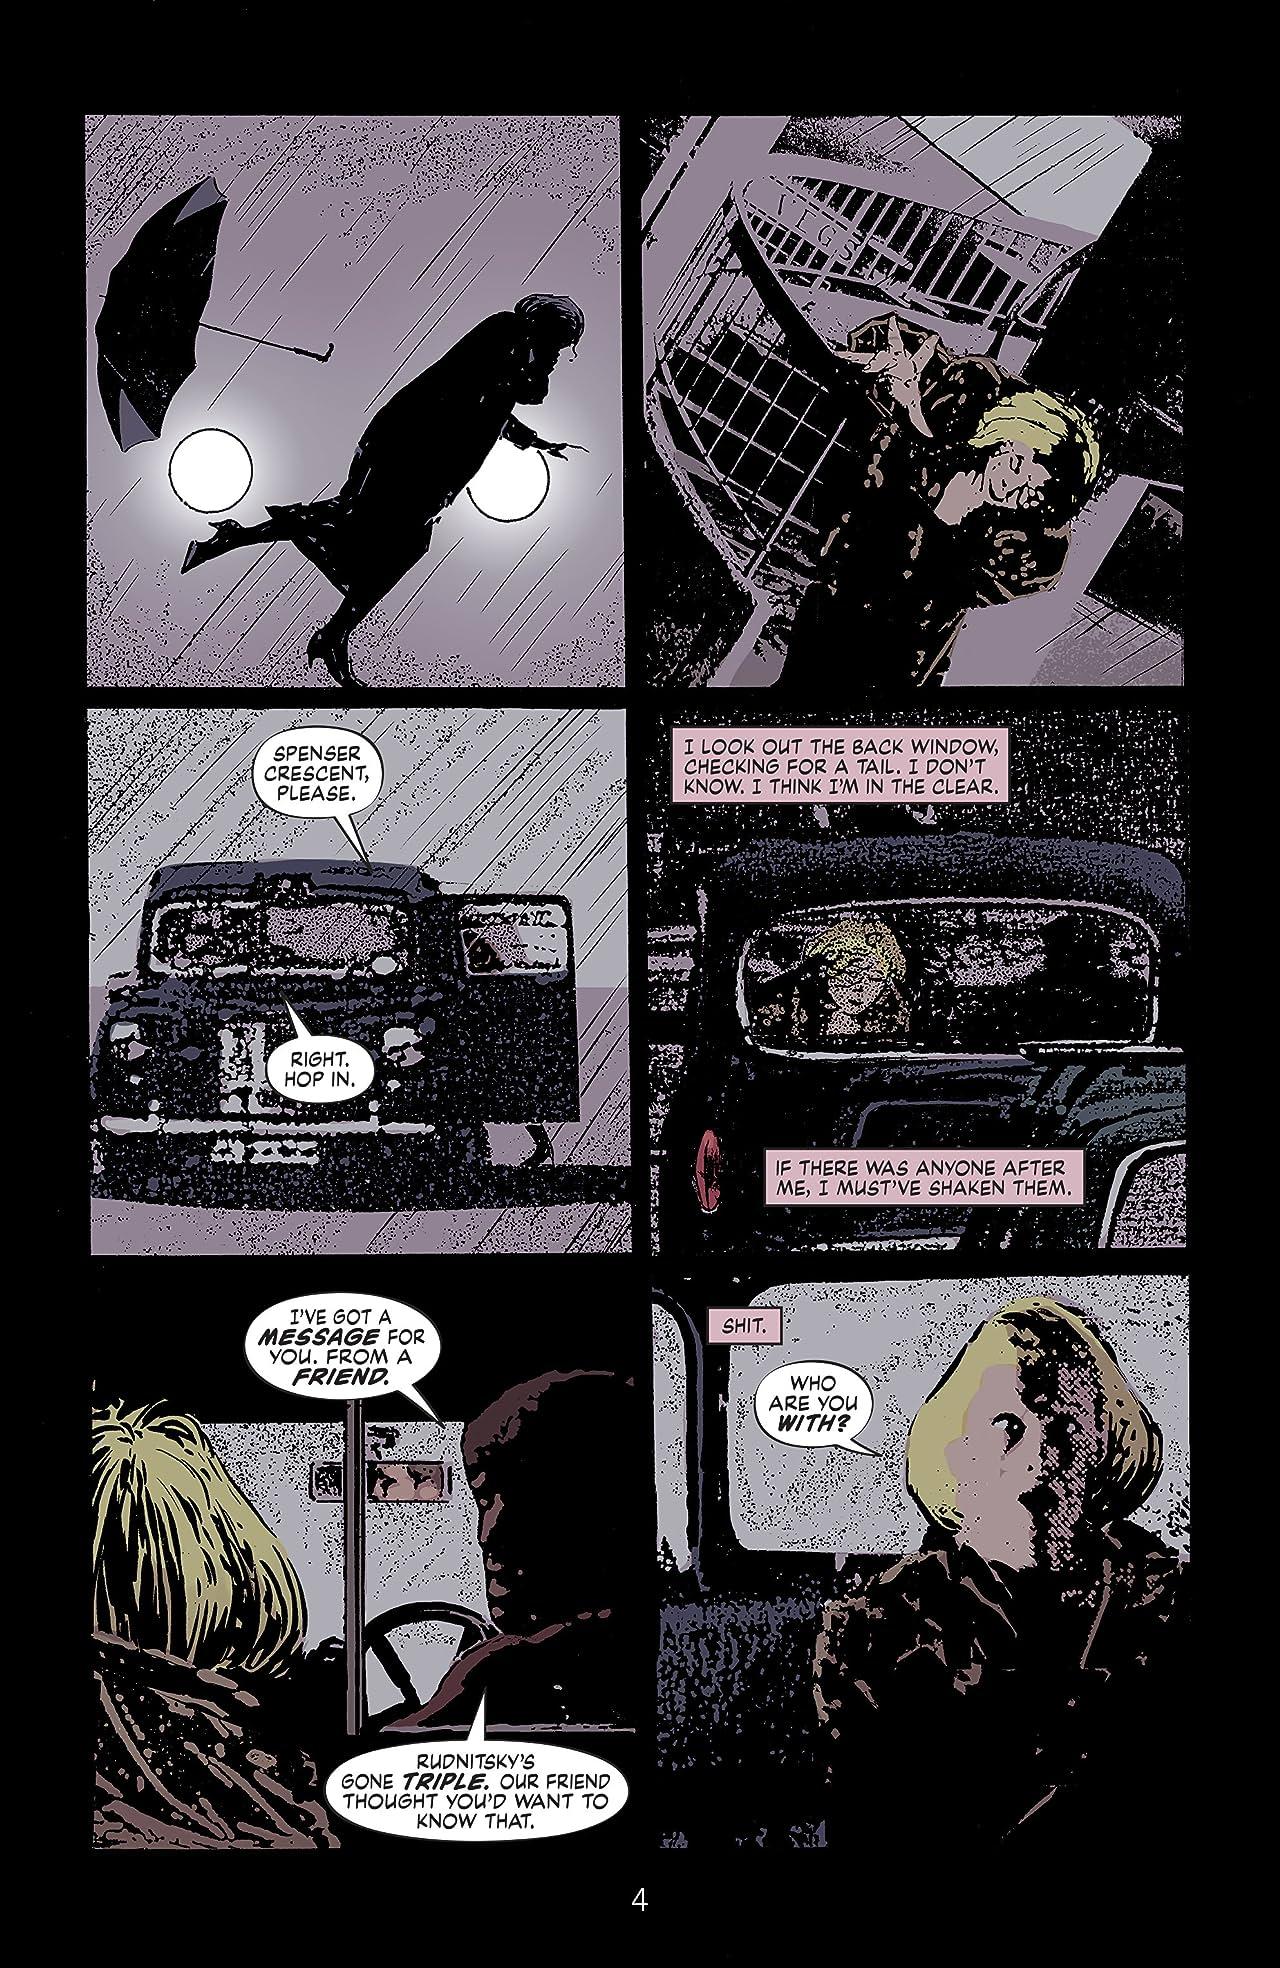 Miracleman by Gaiman & Buckingham #5